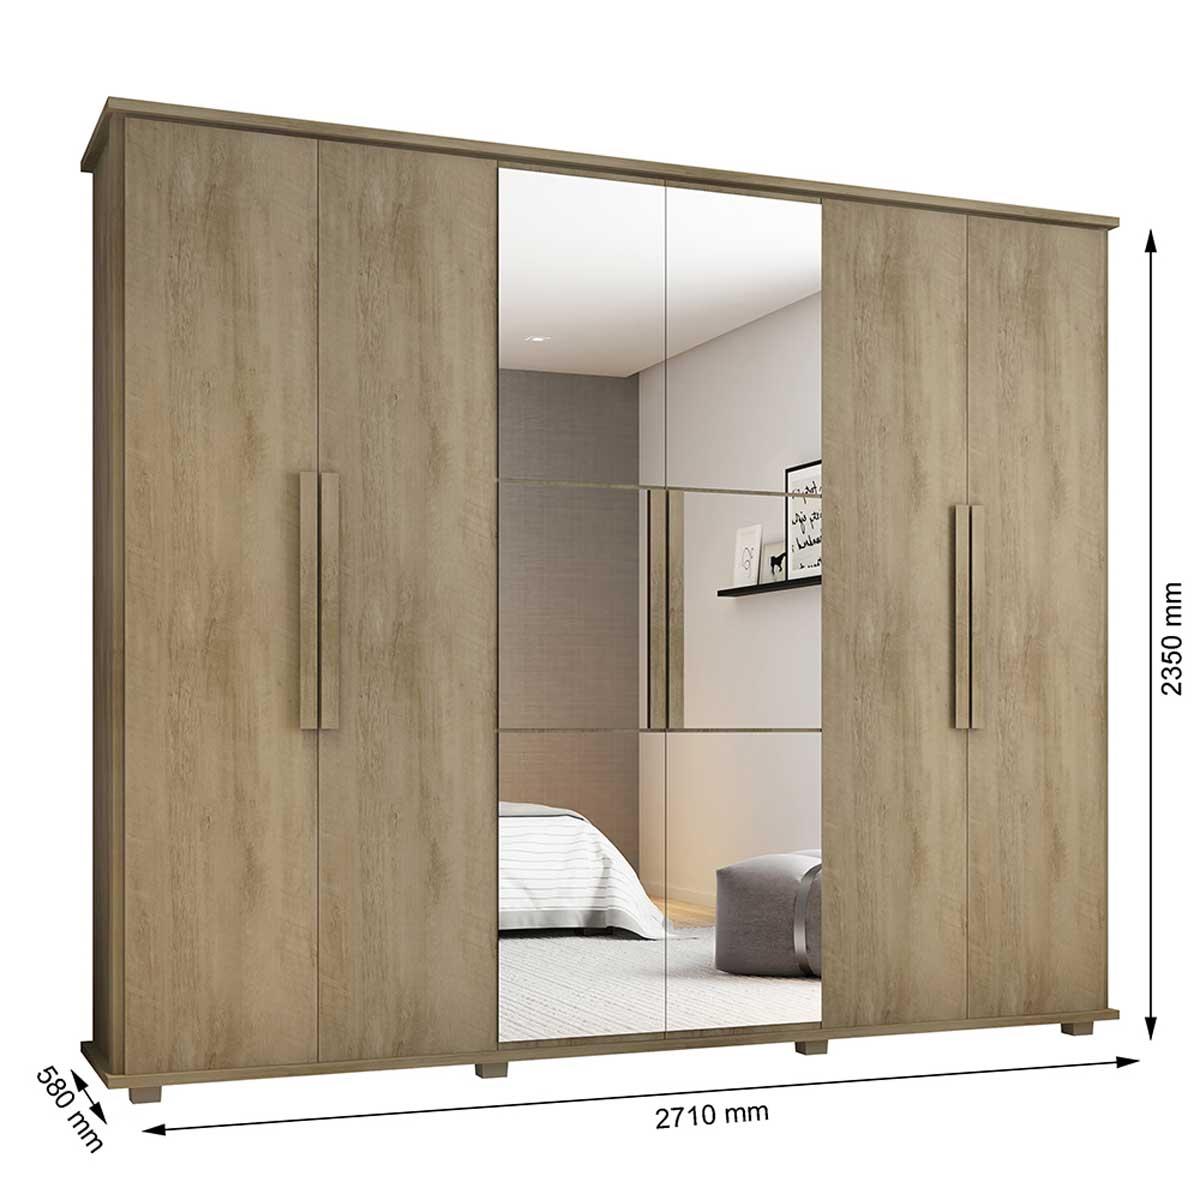 Dormitório Casal Canadá + Requinte Niágara - RV Móveis